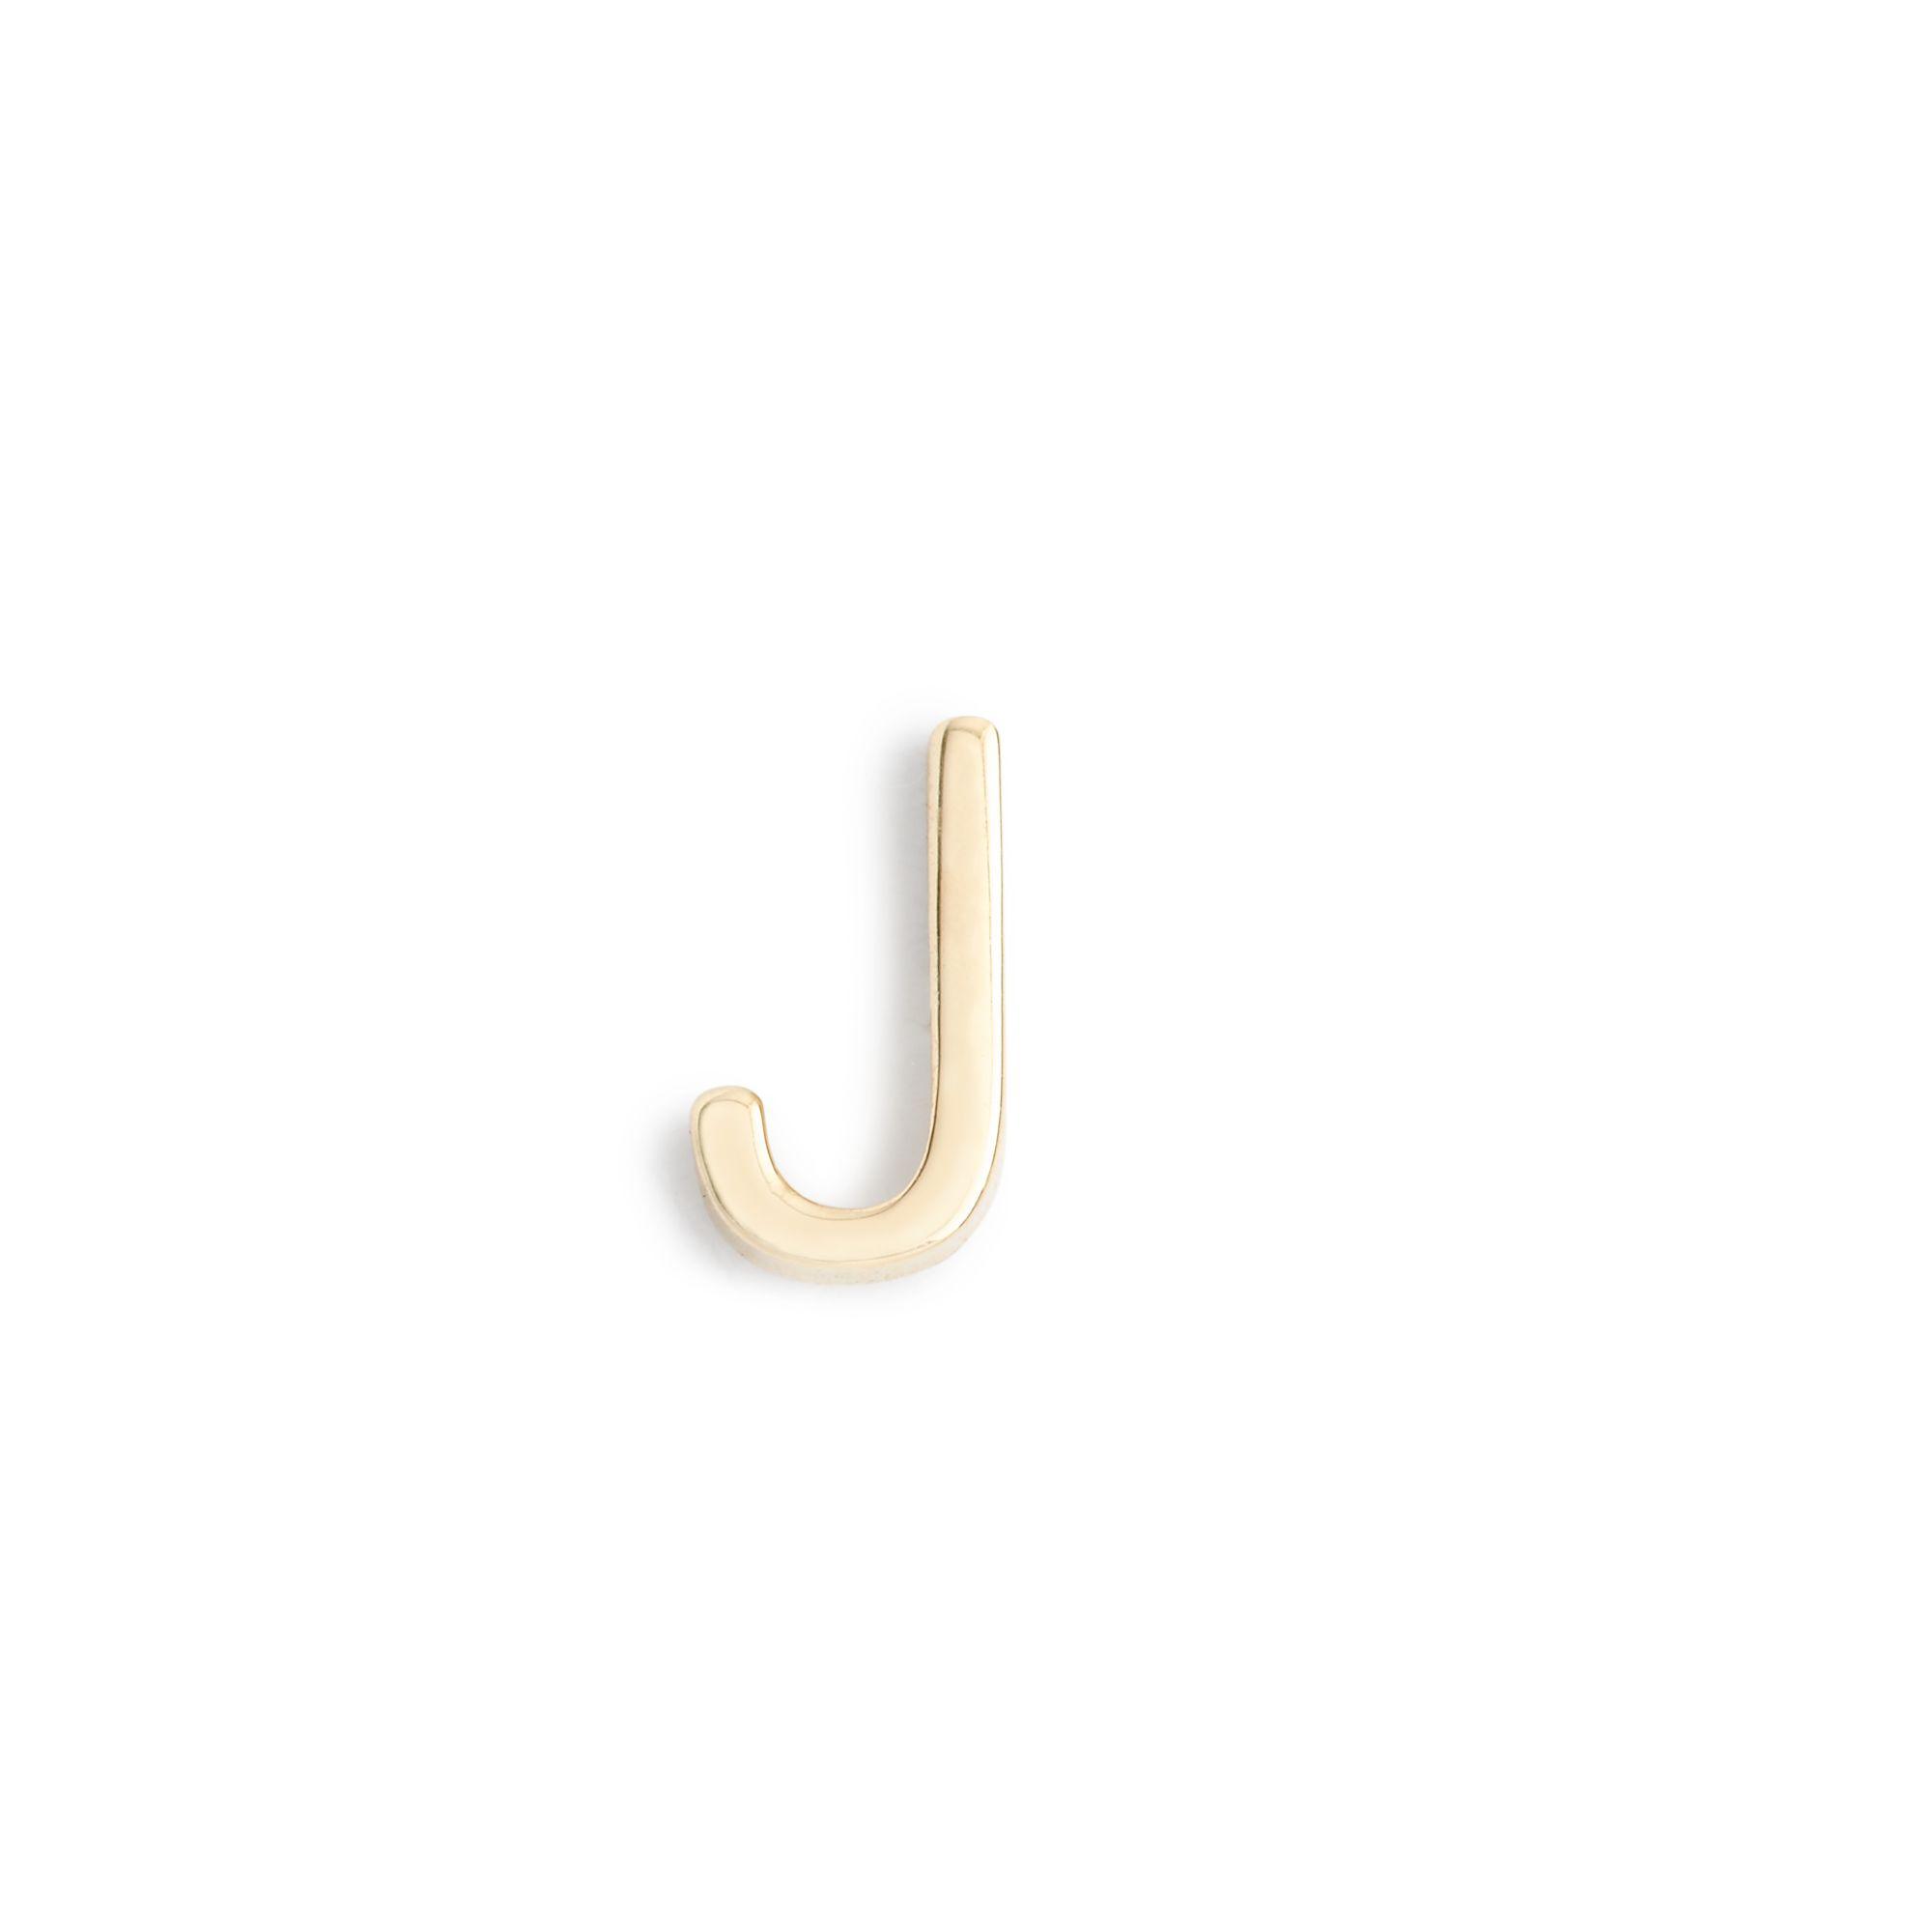 jcrew maya brennerr 14k gold letter earring in gold With letter j earrings